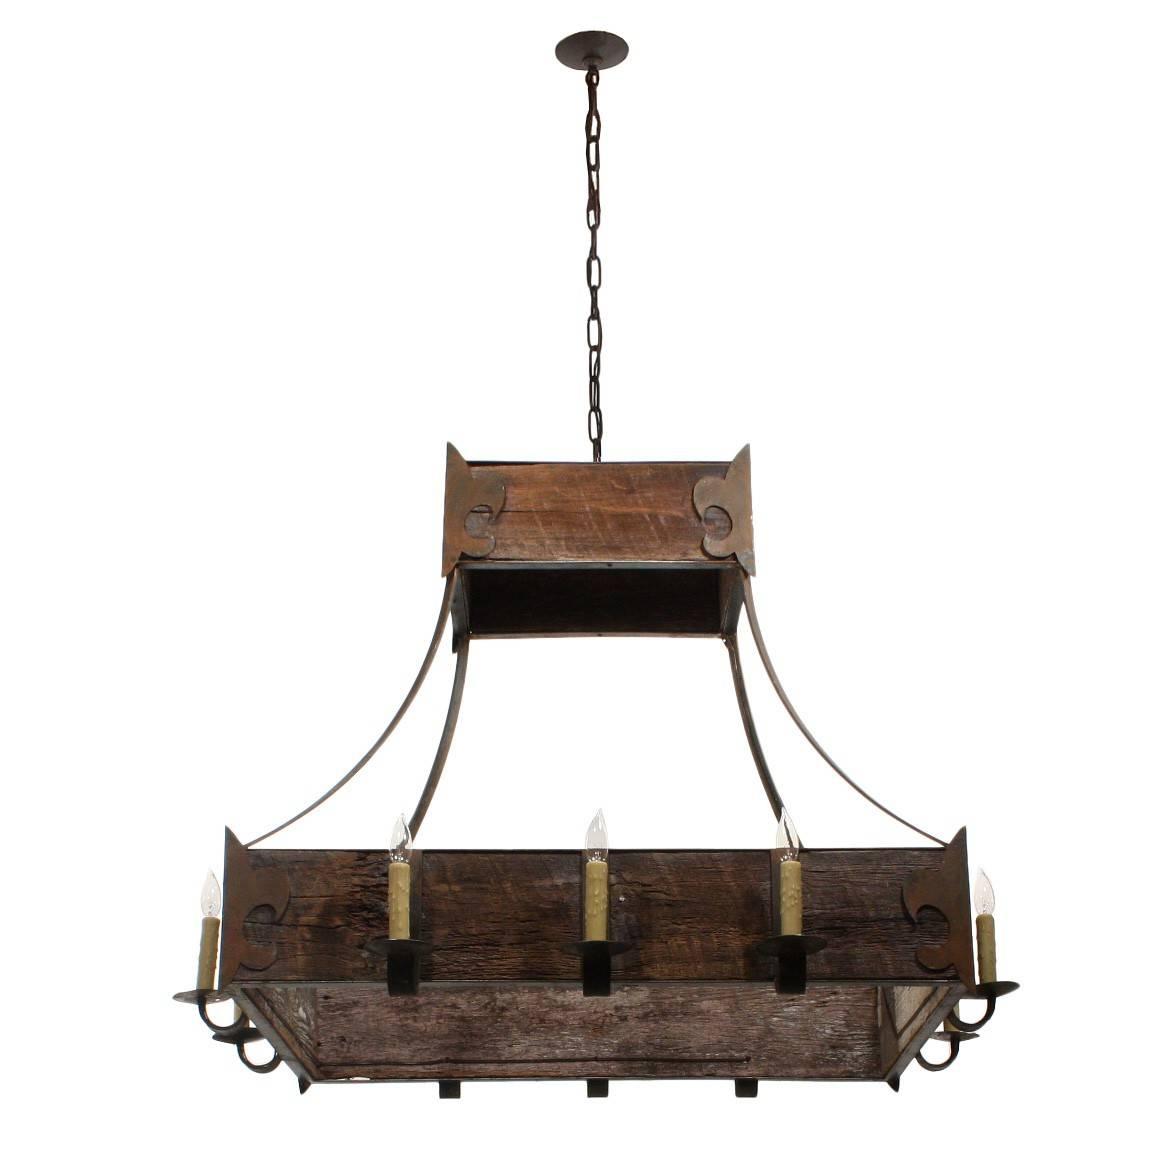 Custom-Made Fleur-De-Lis Iron And Reclaimed Wood Light Fixture inside Fleur De Lis Lights Fixtures (Image 5 of 15)